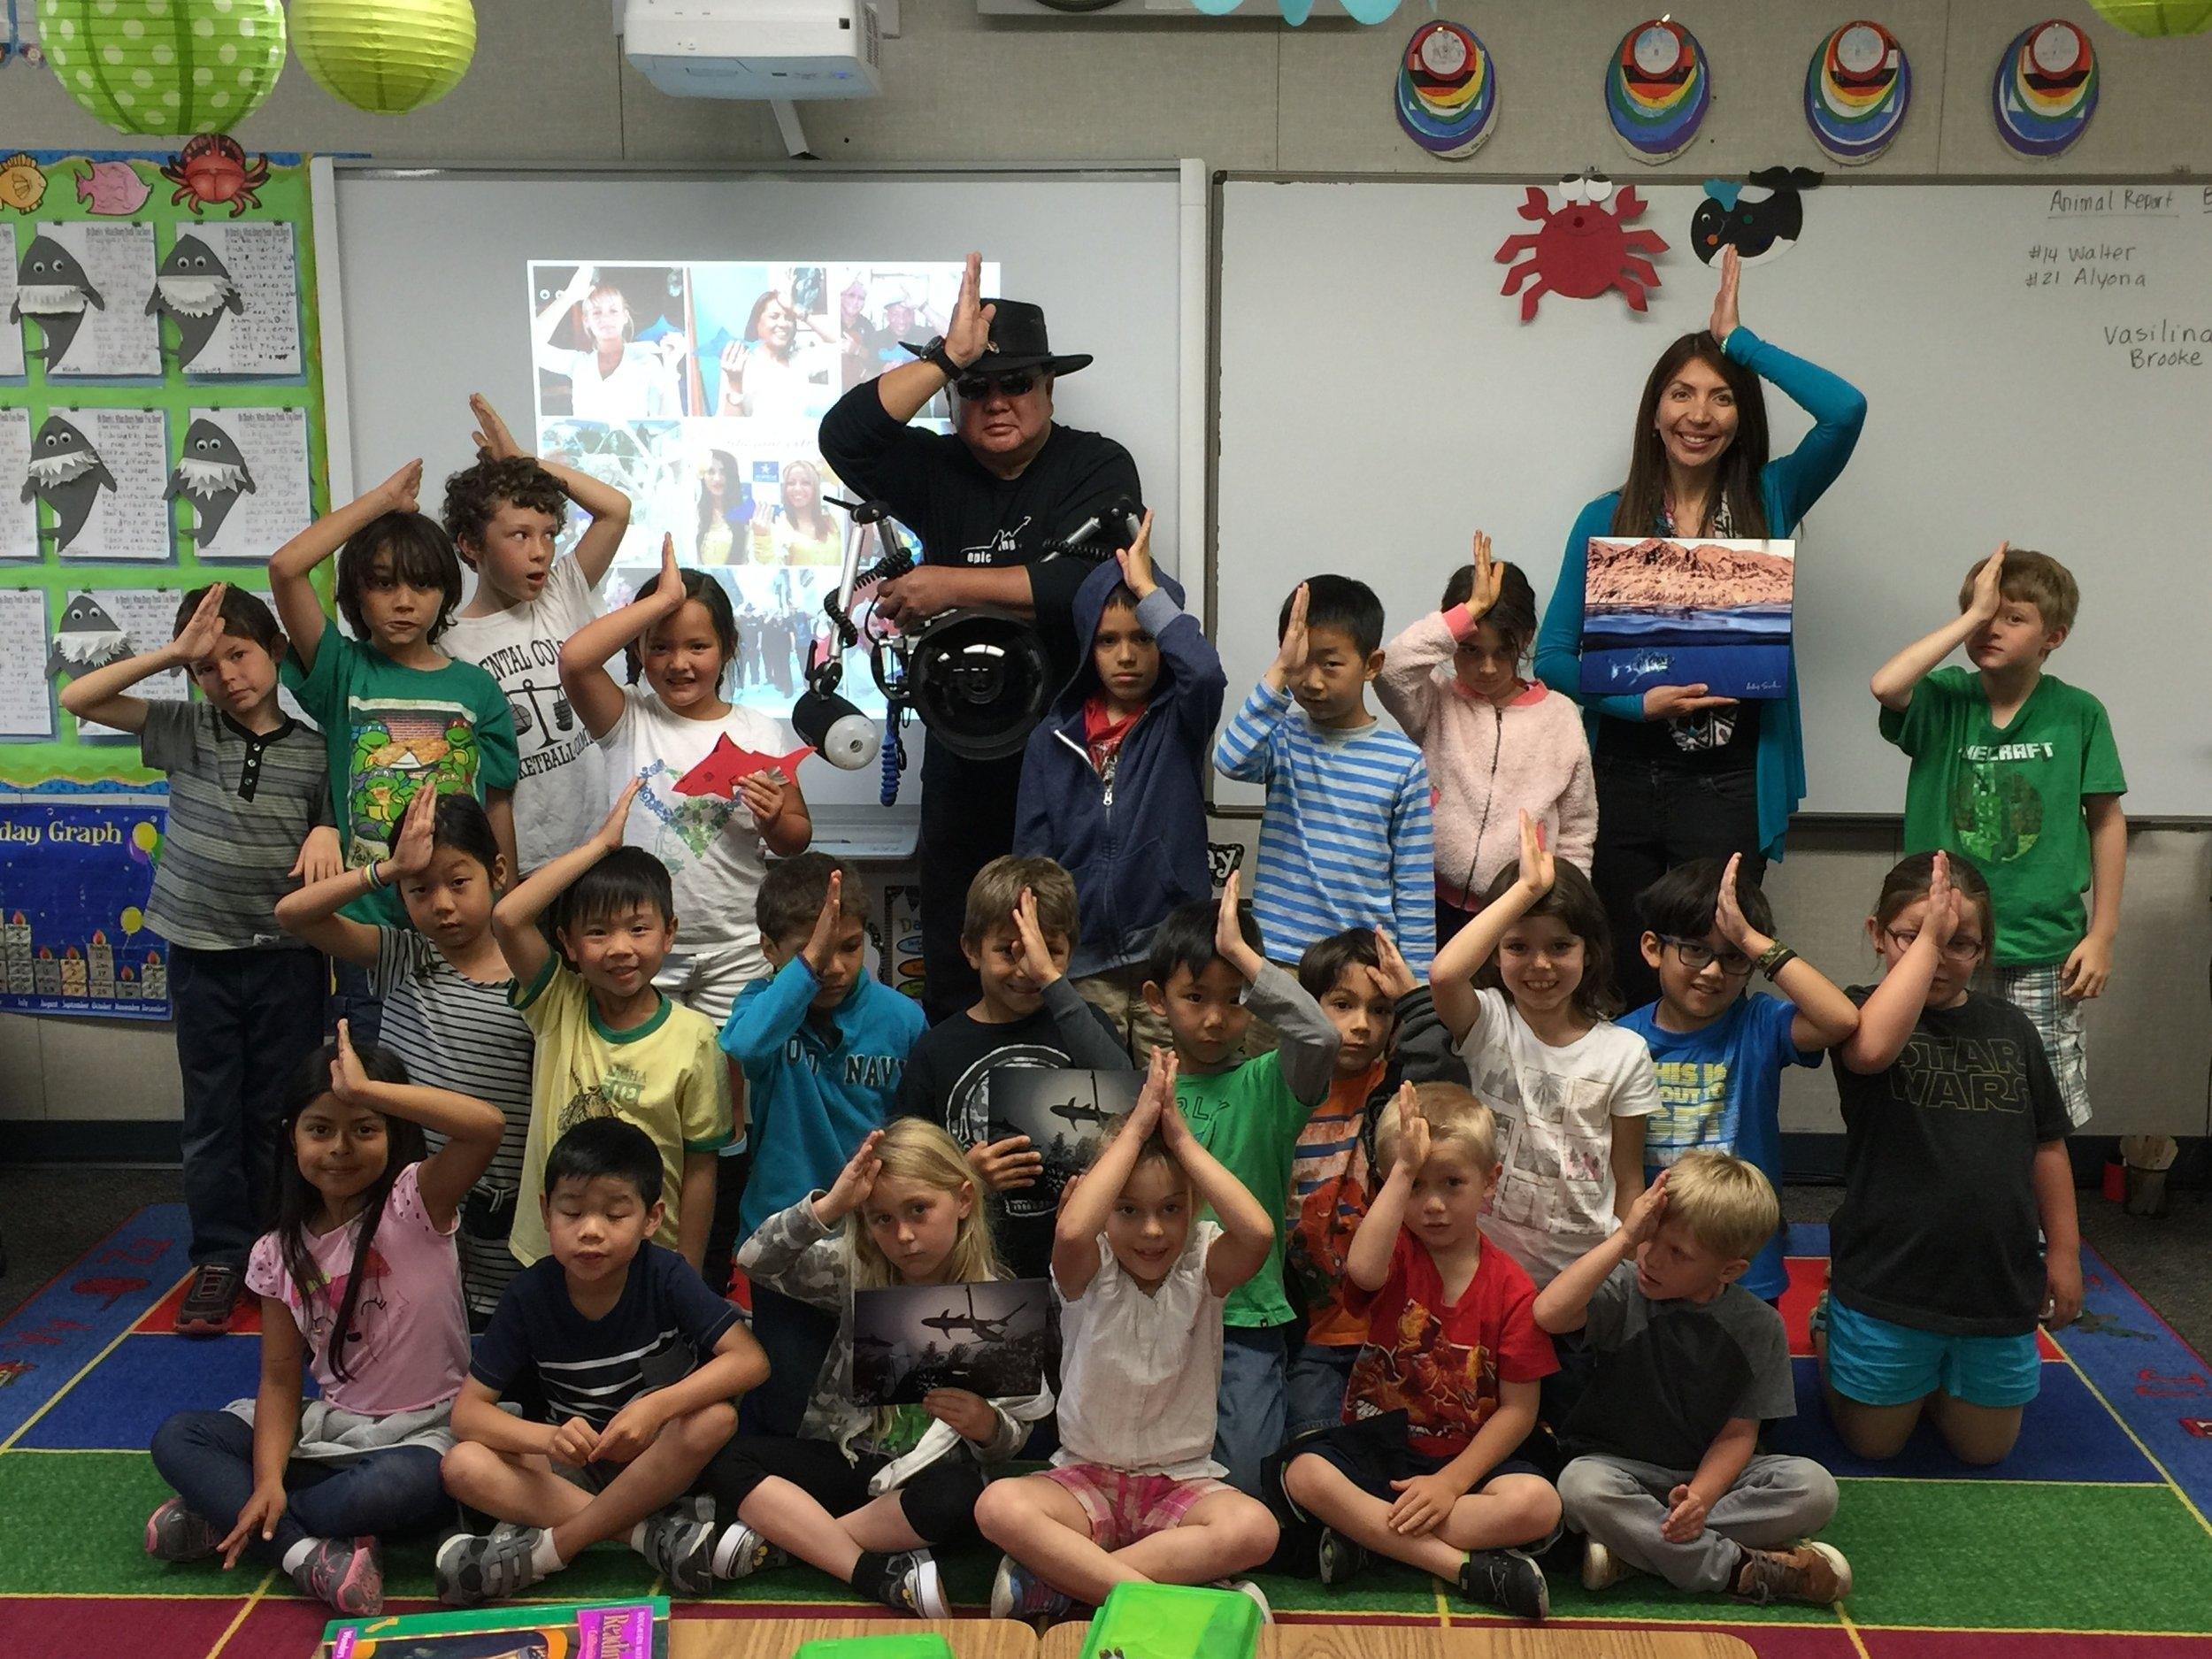 #SpenceTheShark Presentation to So Pasadena Elementary School class